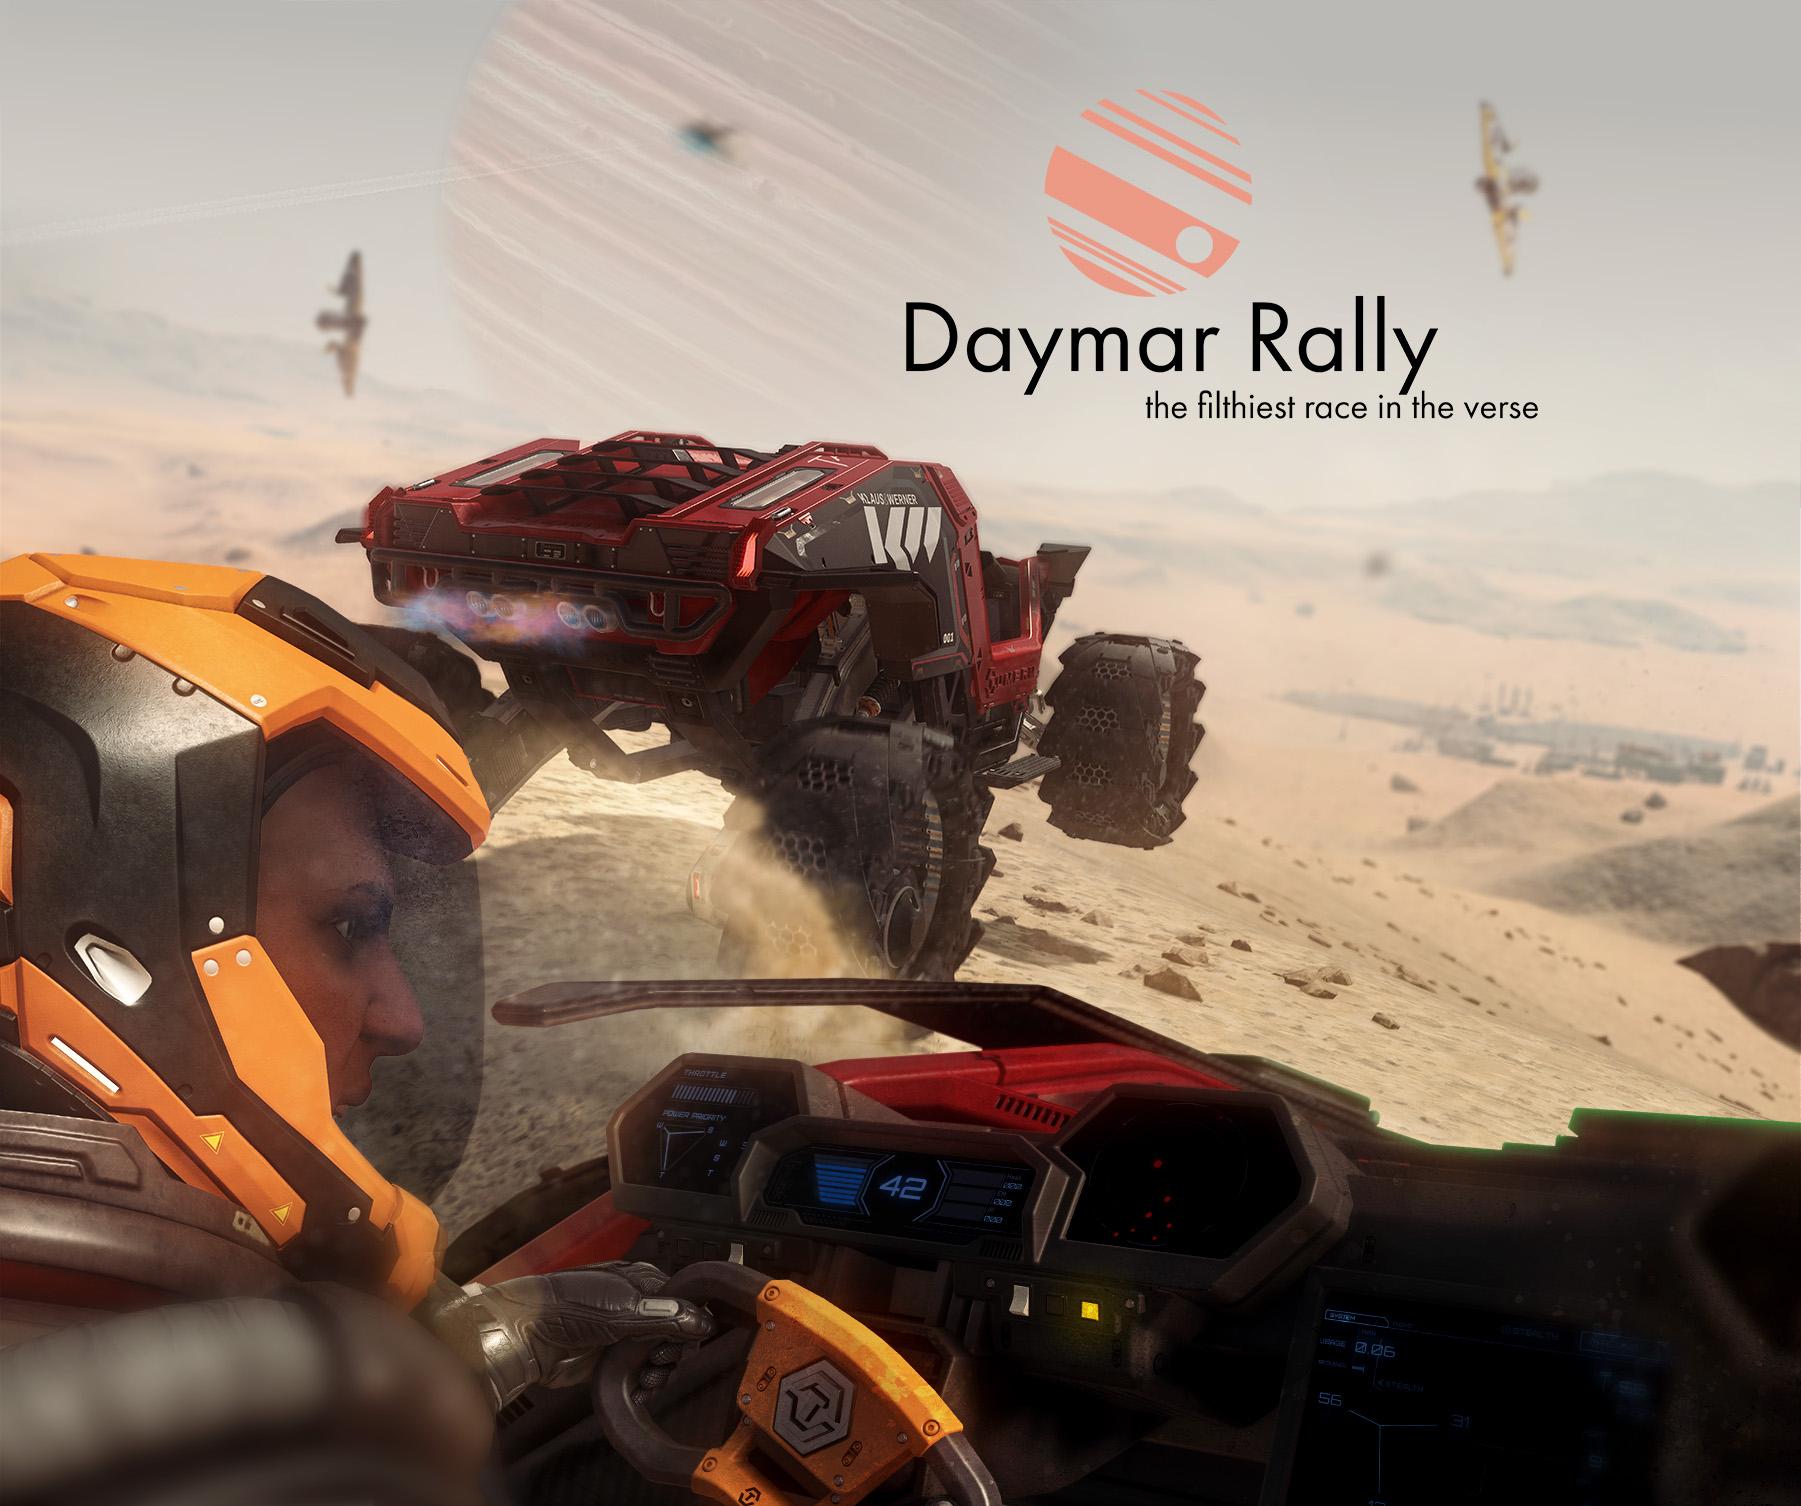 Daymar Rally CitizenCon 2019 Booth Backdrop